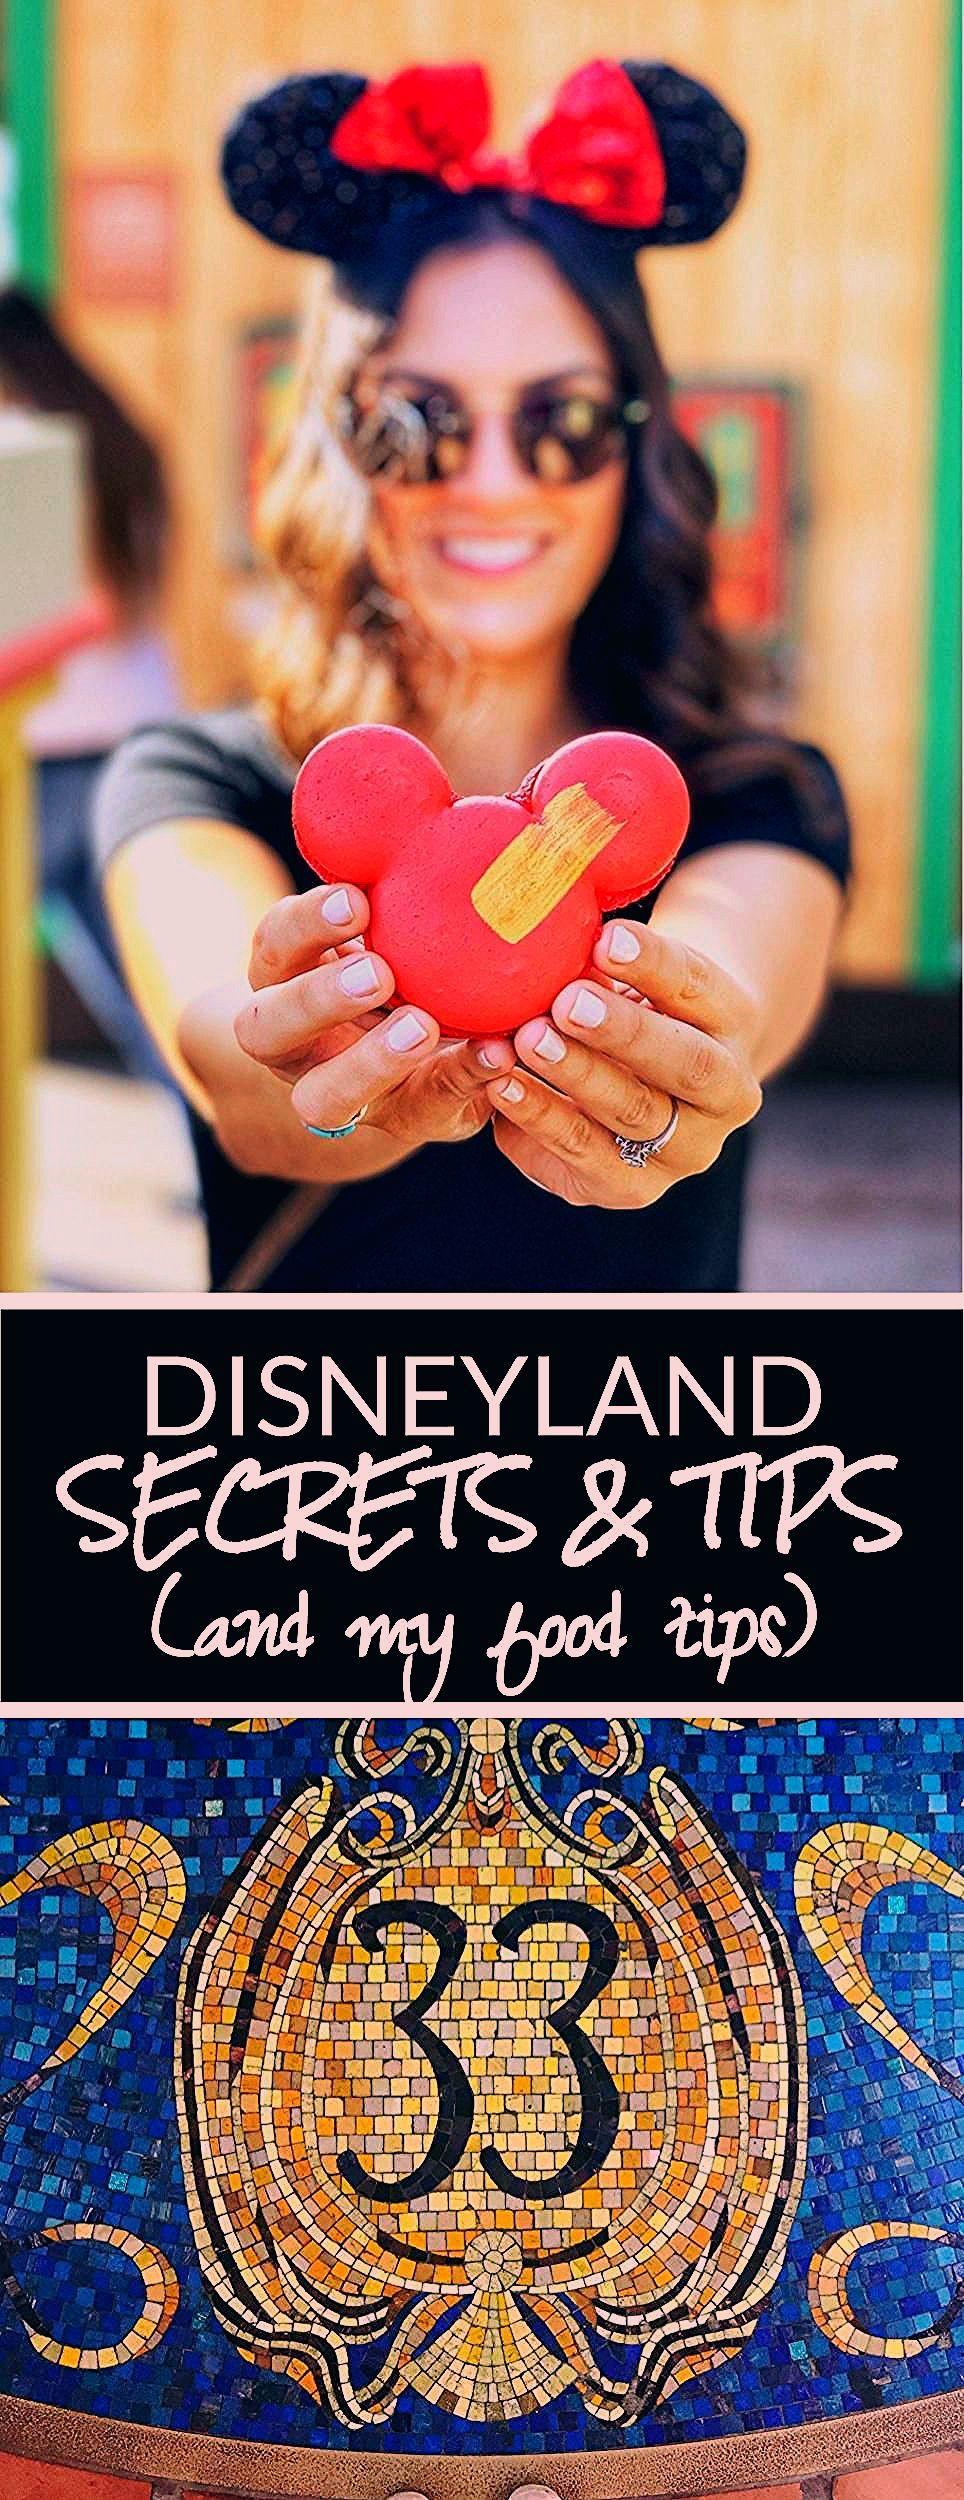 Photo of Disneyland Food